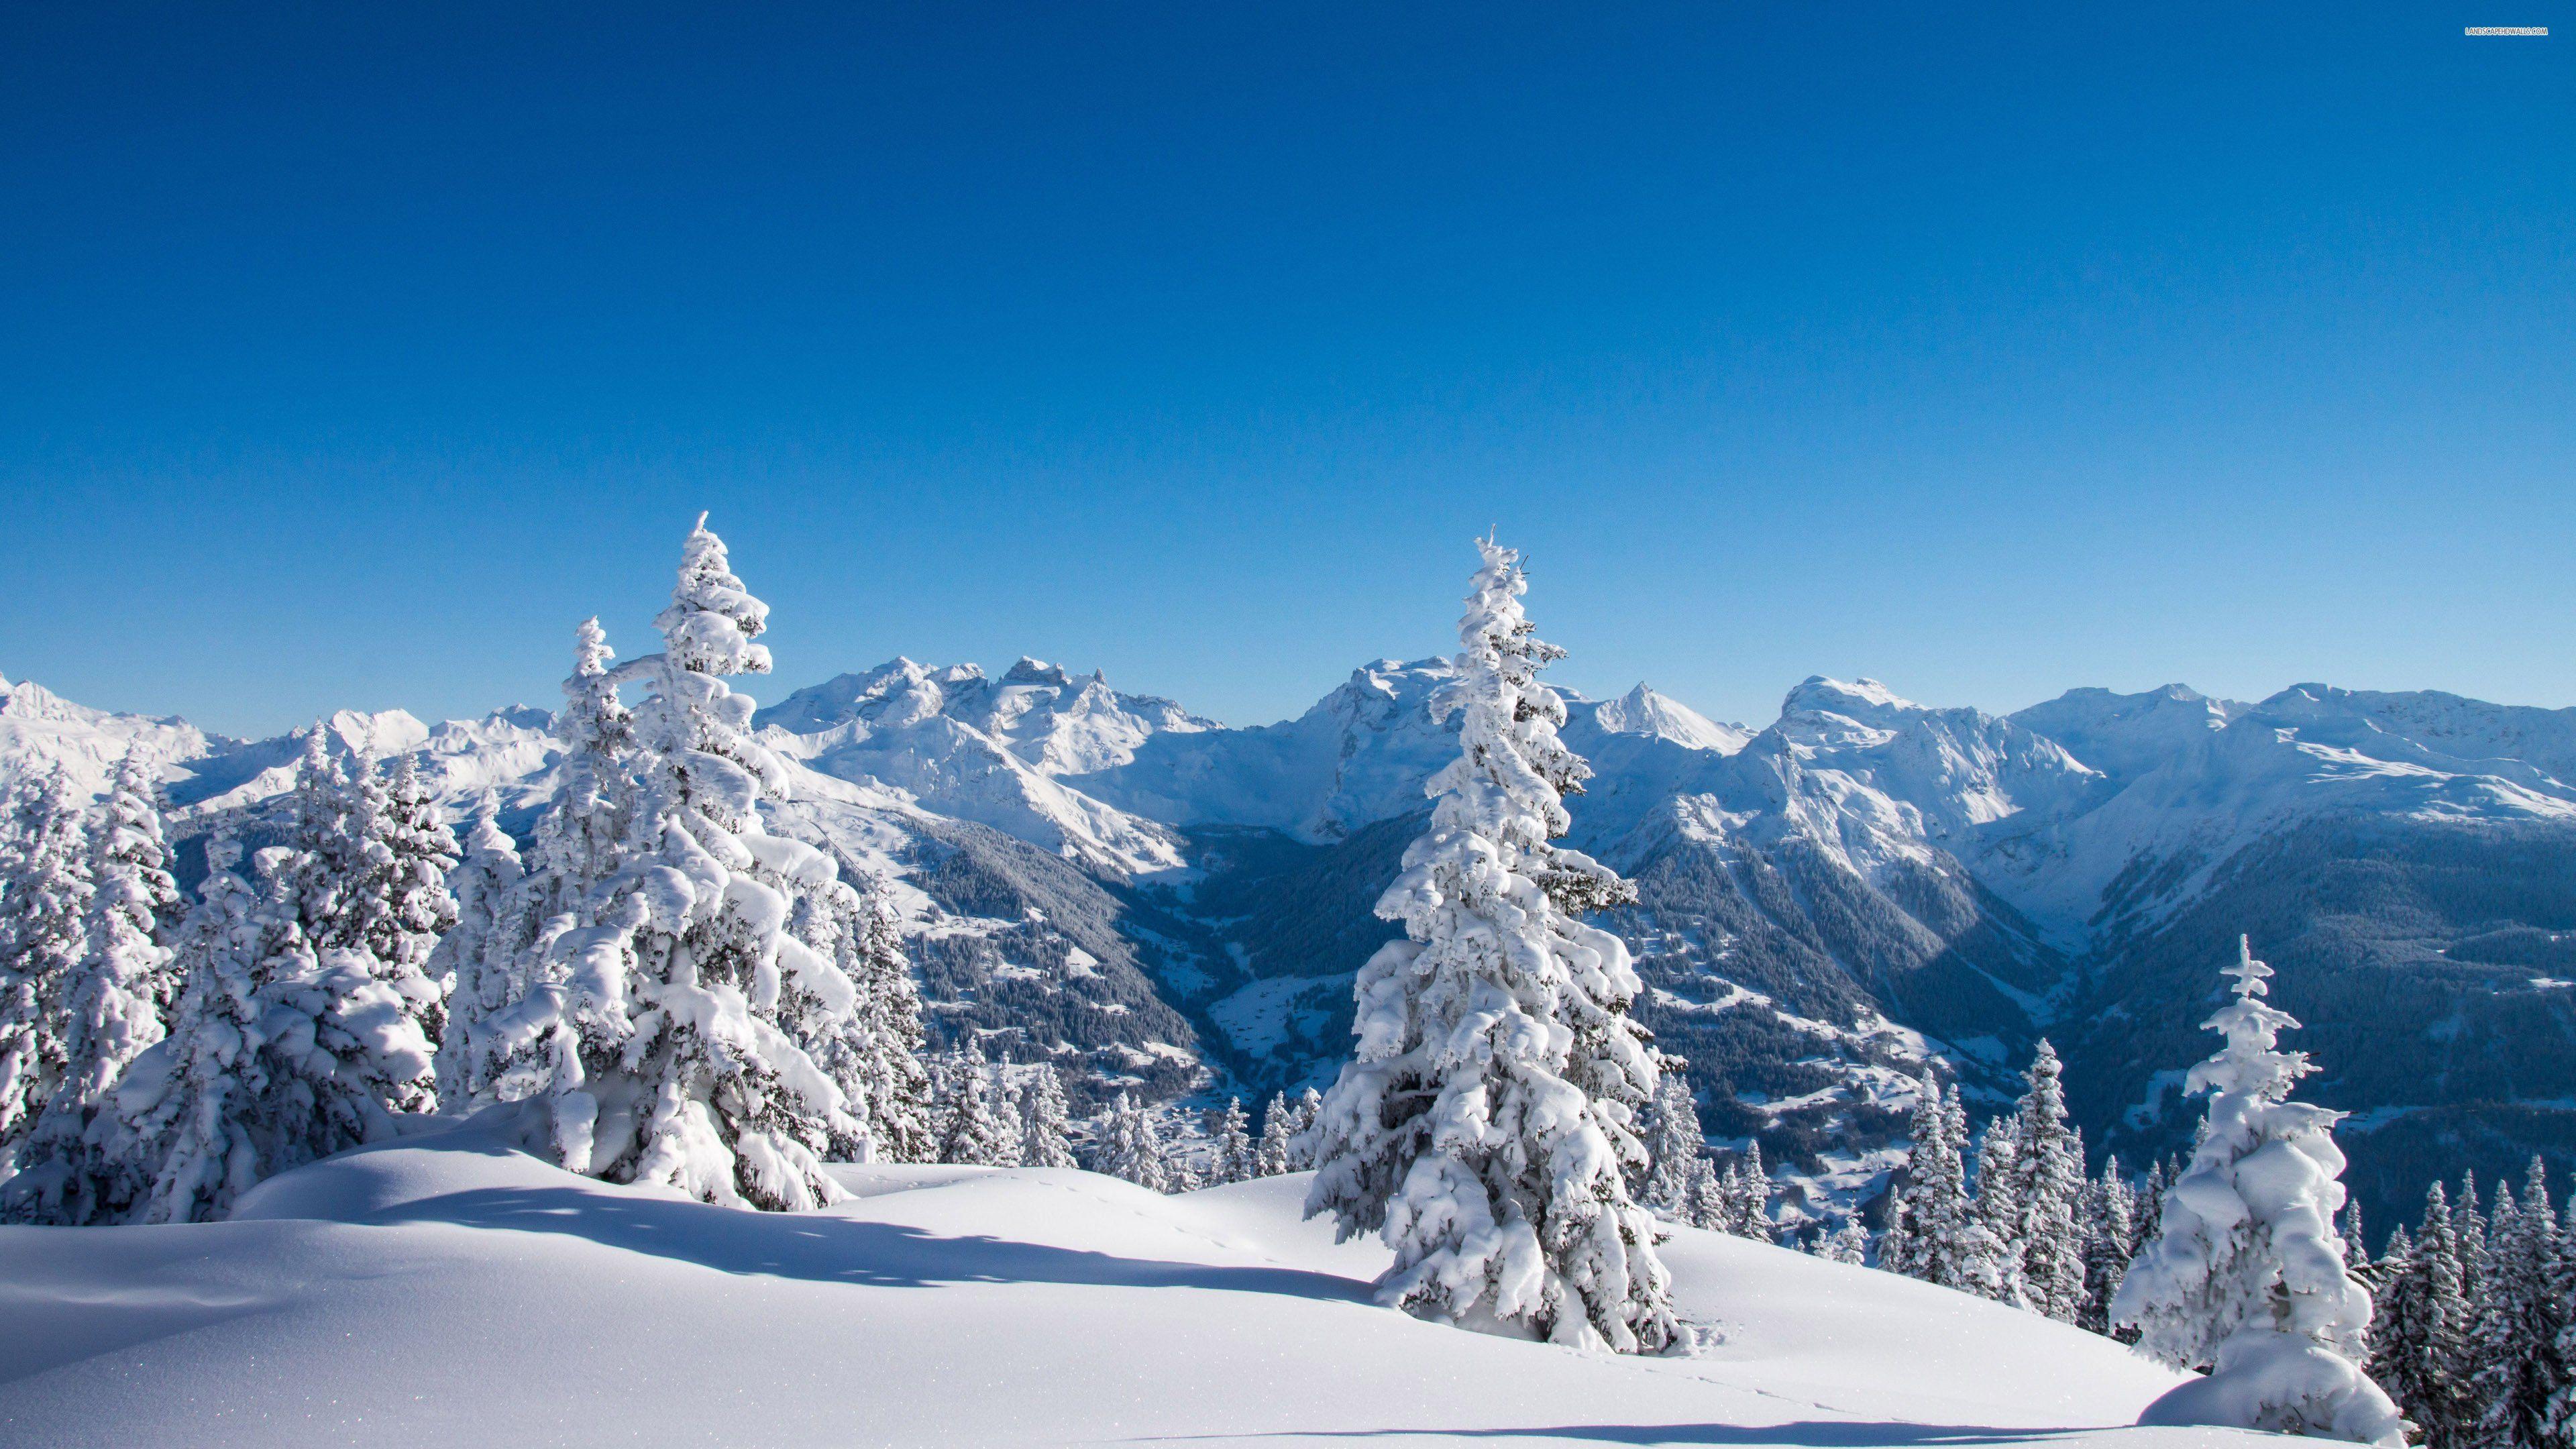 Pin Fondos Montana Nevada 1440x900 Widescreen Wallpapers: Winter Mountain Desktop Wallpaper HD Winter Mountain